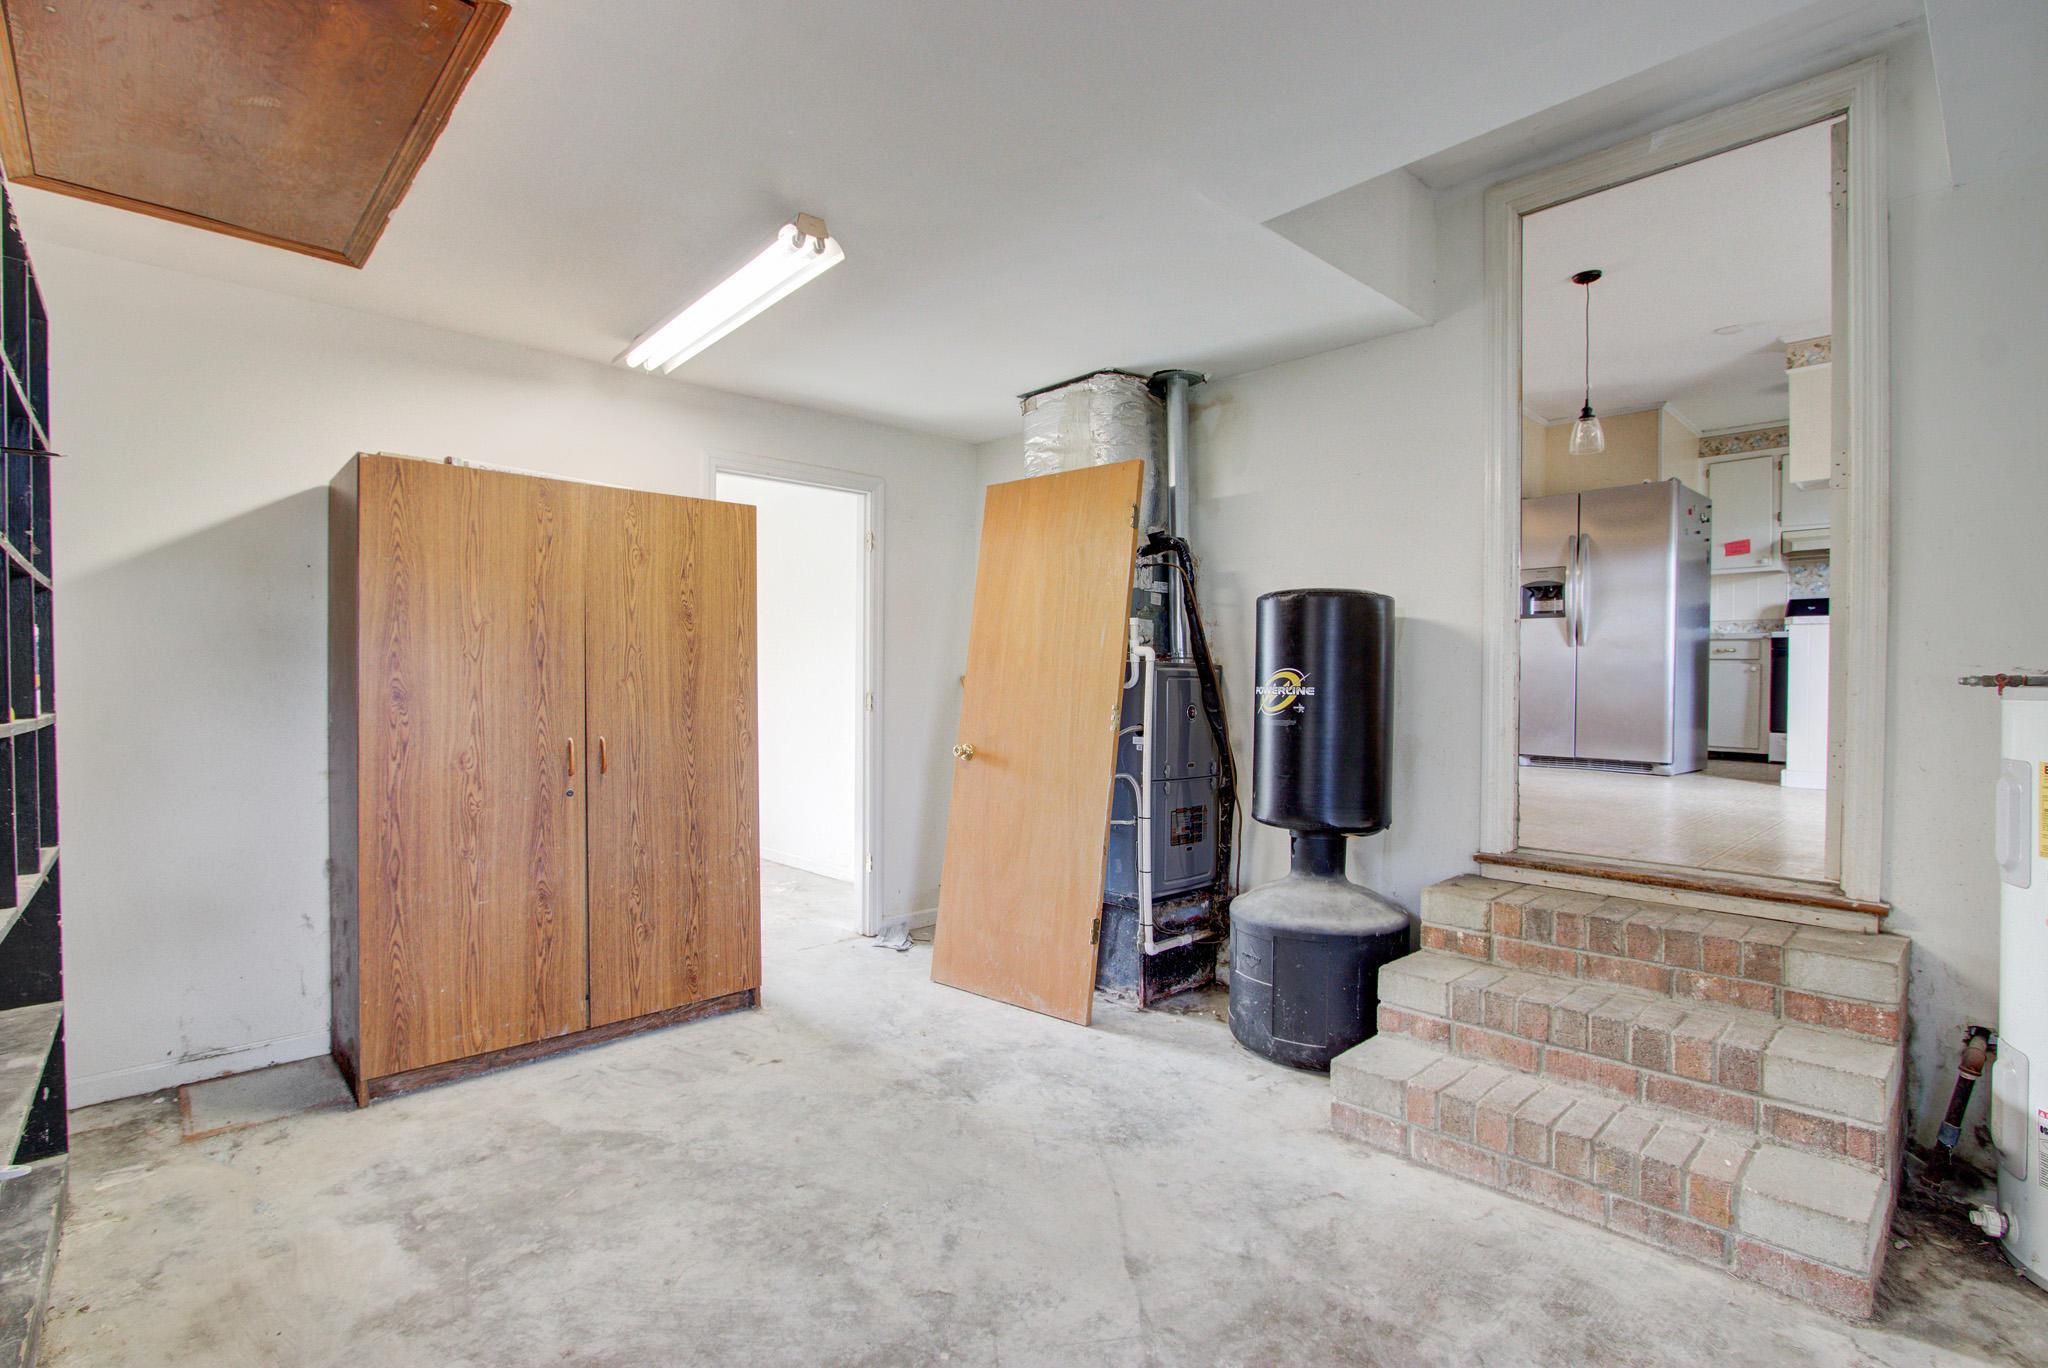 Bushy Park Terrace Homes For Sale - 125 Azalea, Goose Creek, SC - 4